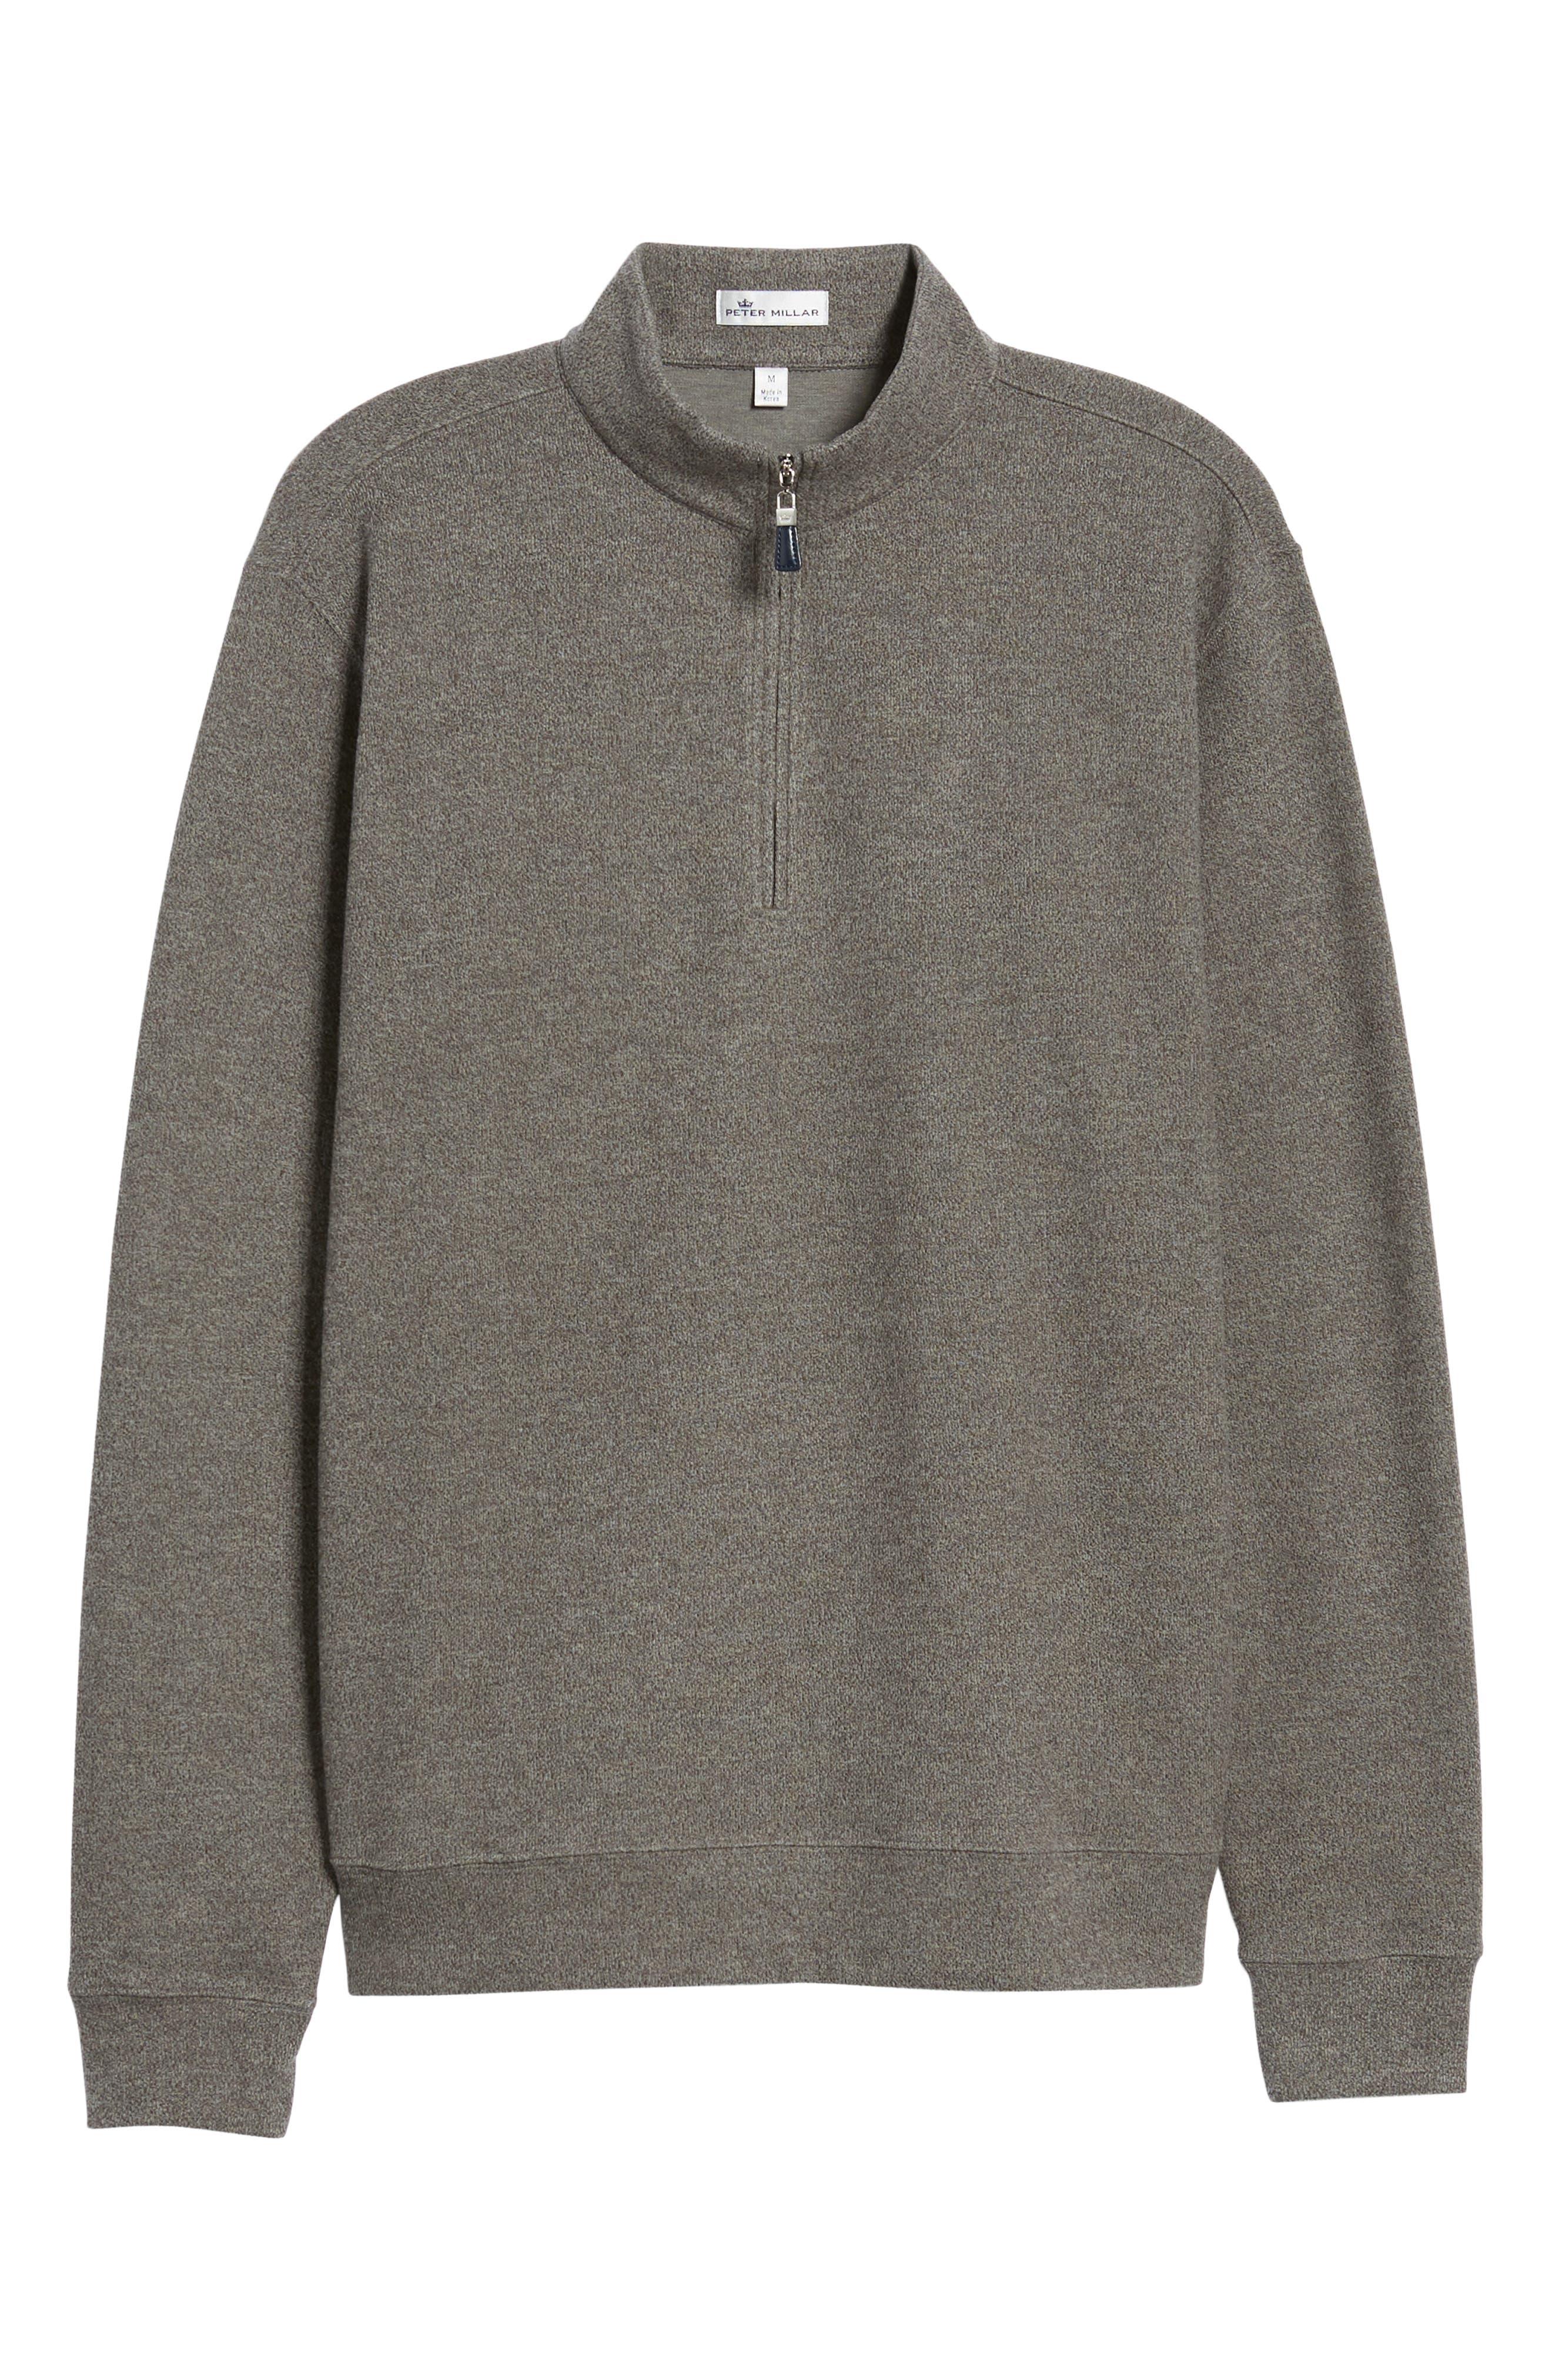 Mélange Fleece Quarter Zip Pullover,                             Alternate thumbnail 6, color,                             SMOKE